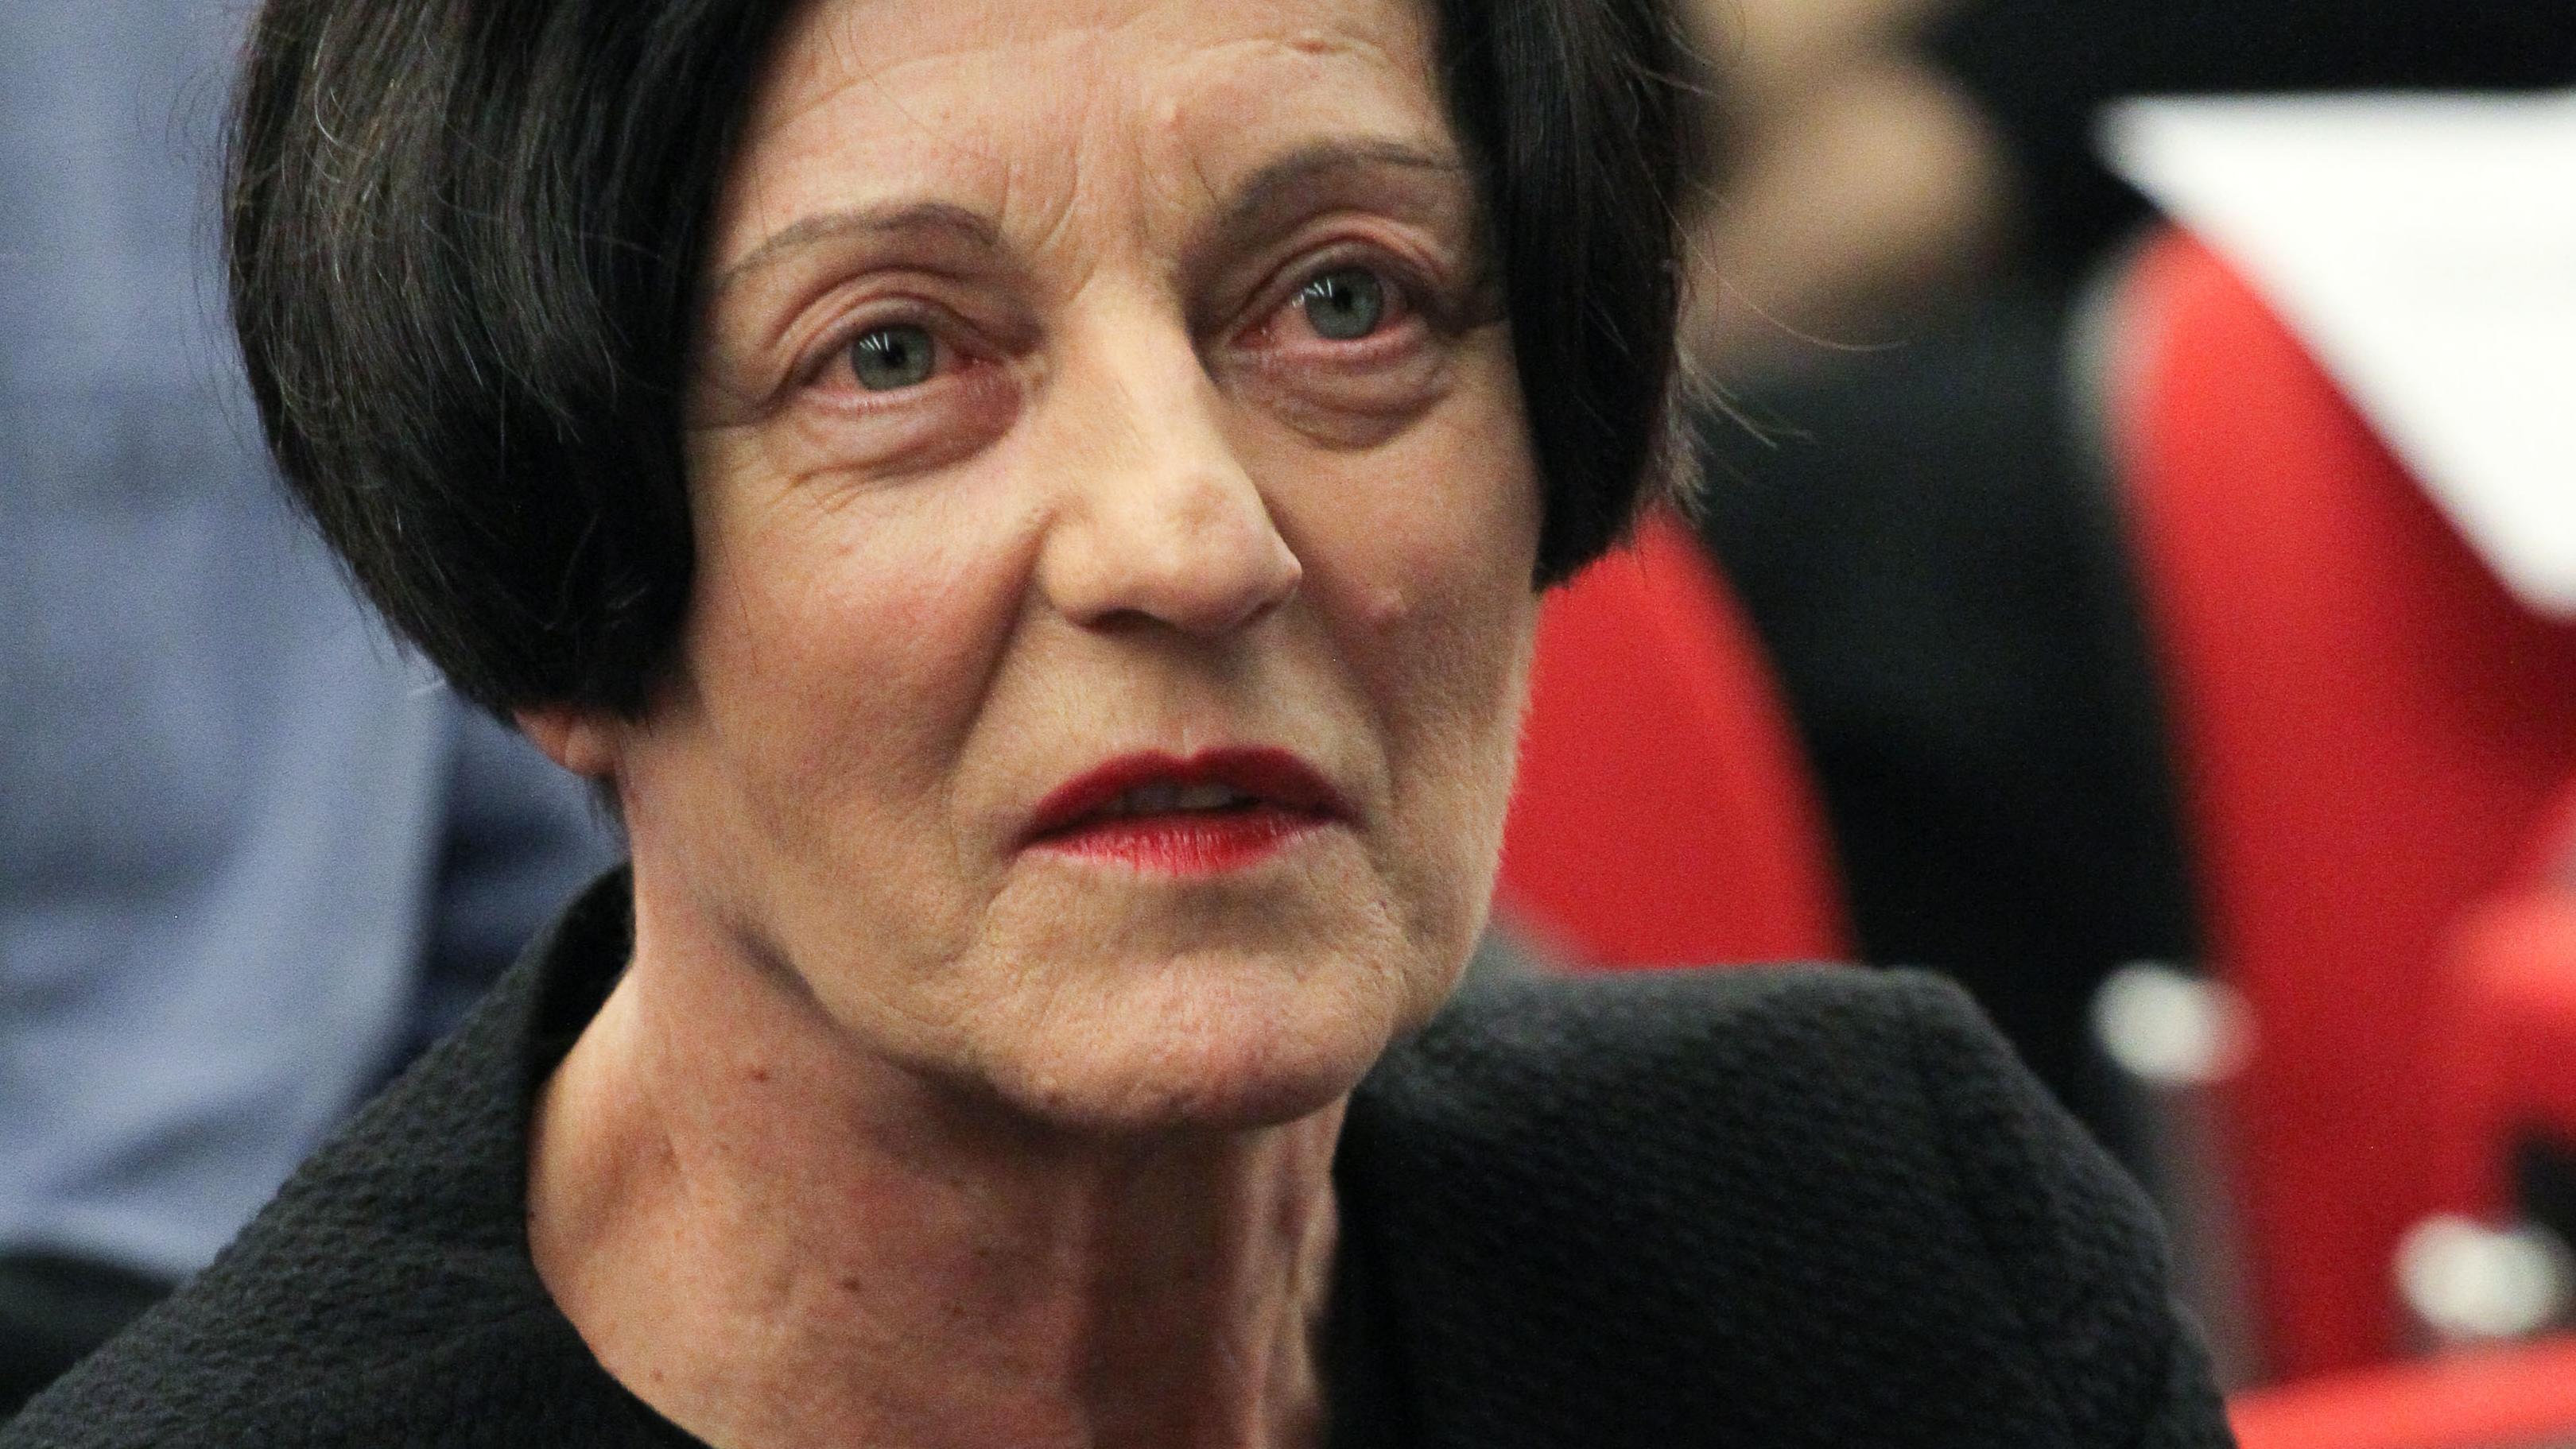 Schriftstellerin Herta Müller